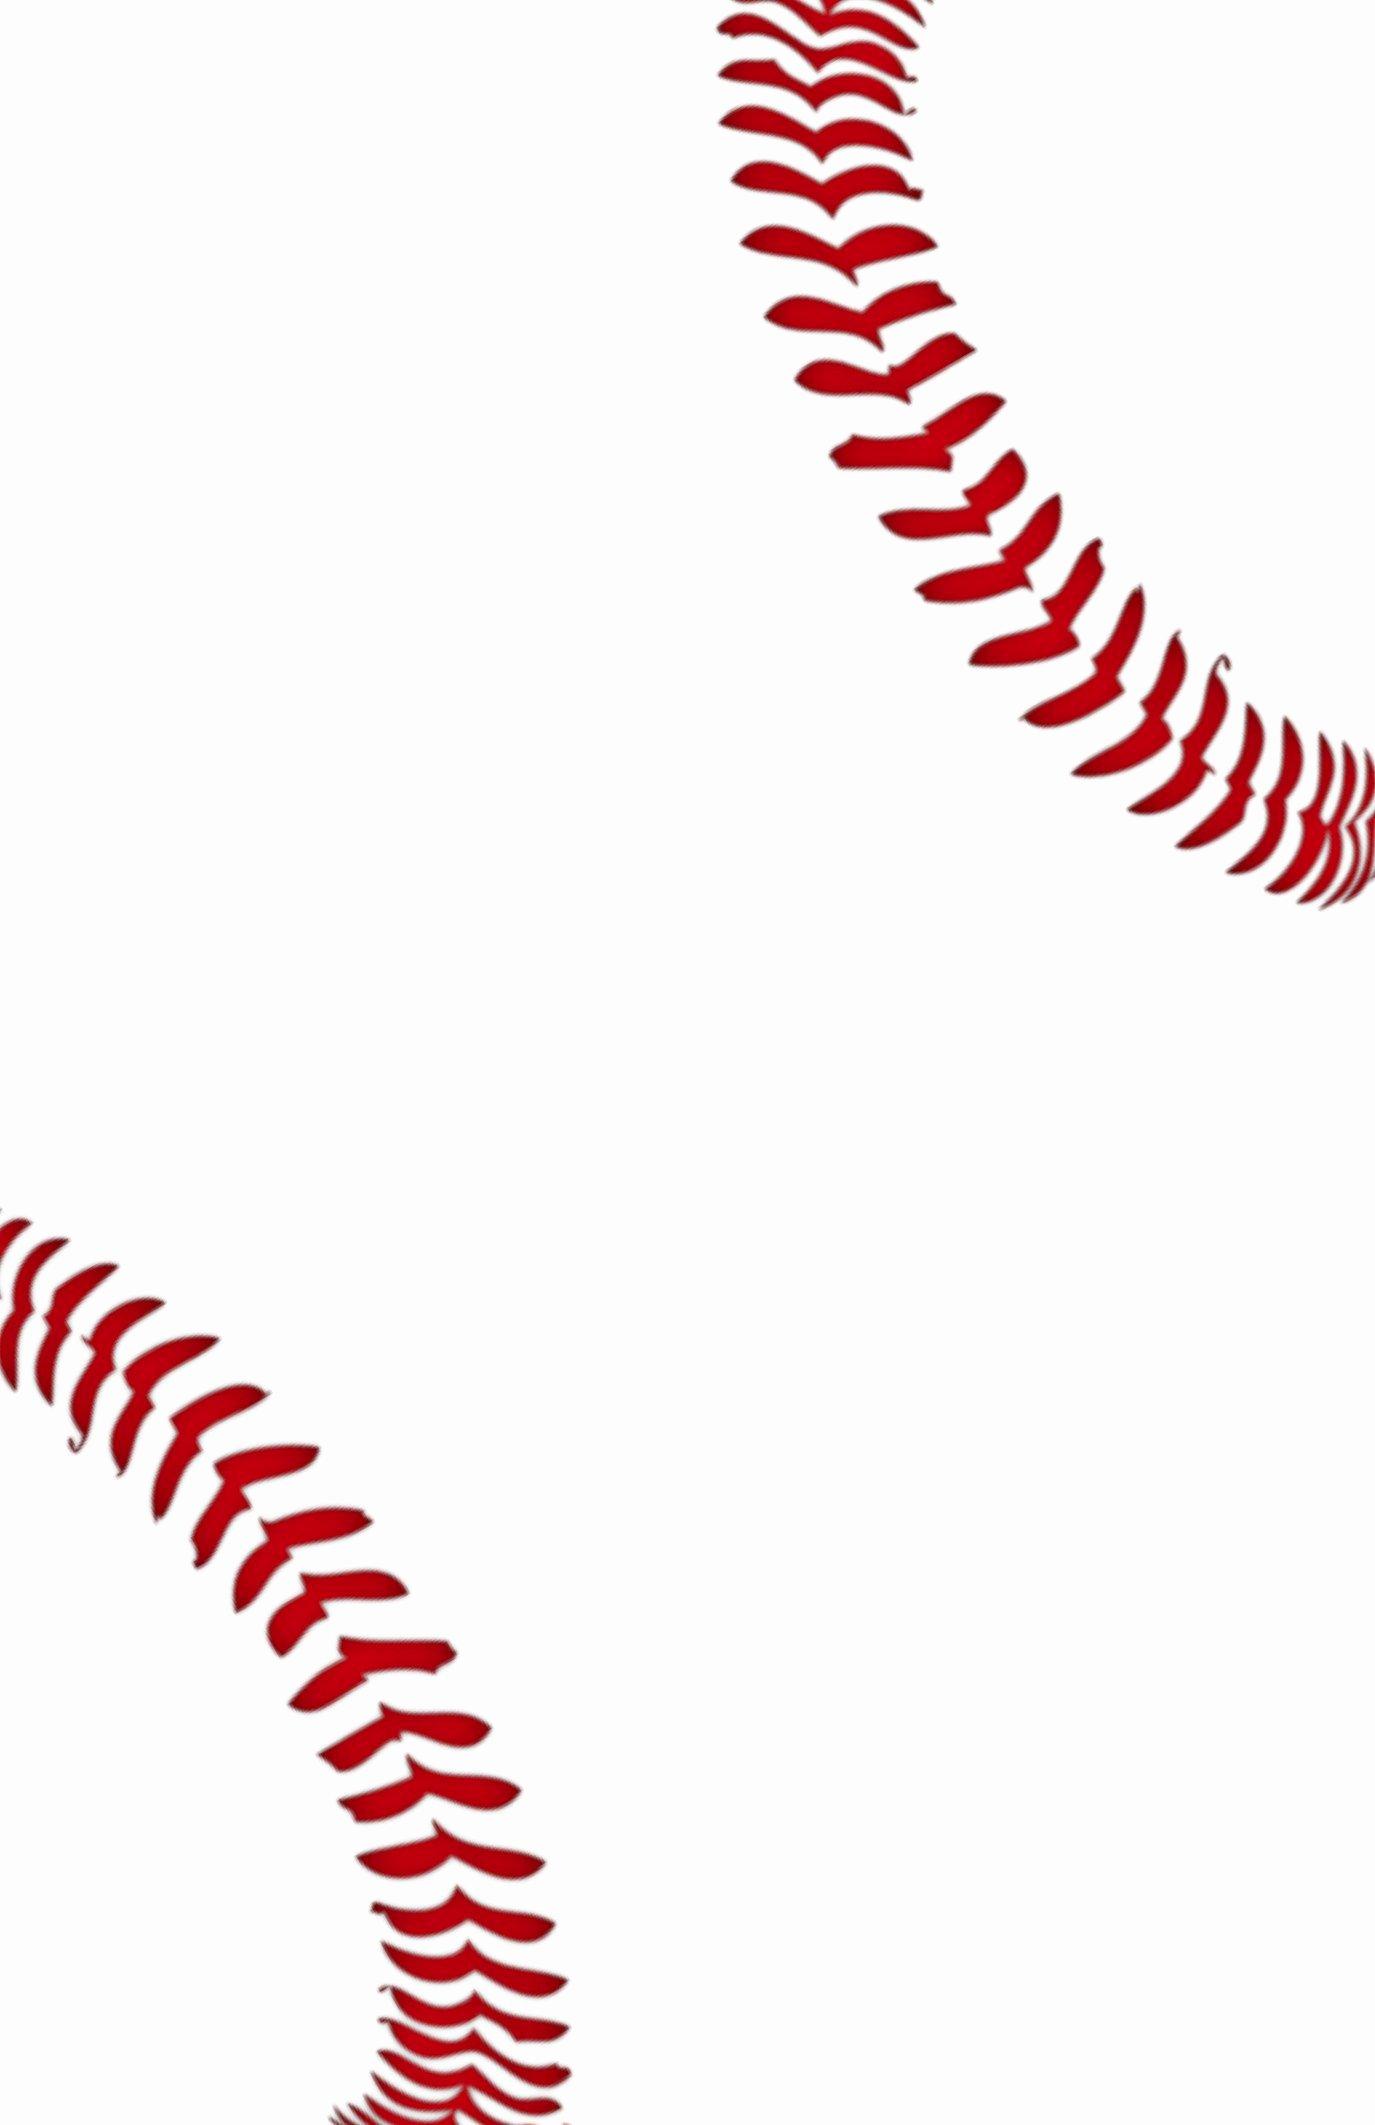 Baseball Invitation Template Free Beautiful Baseball Party Invitations Free Printable